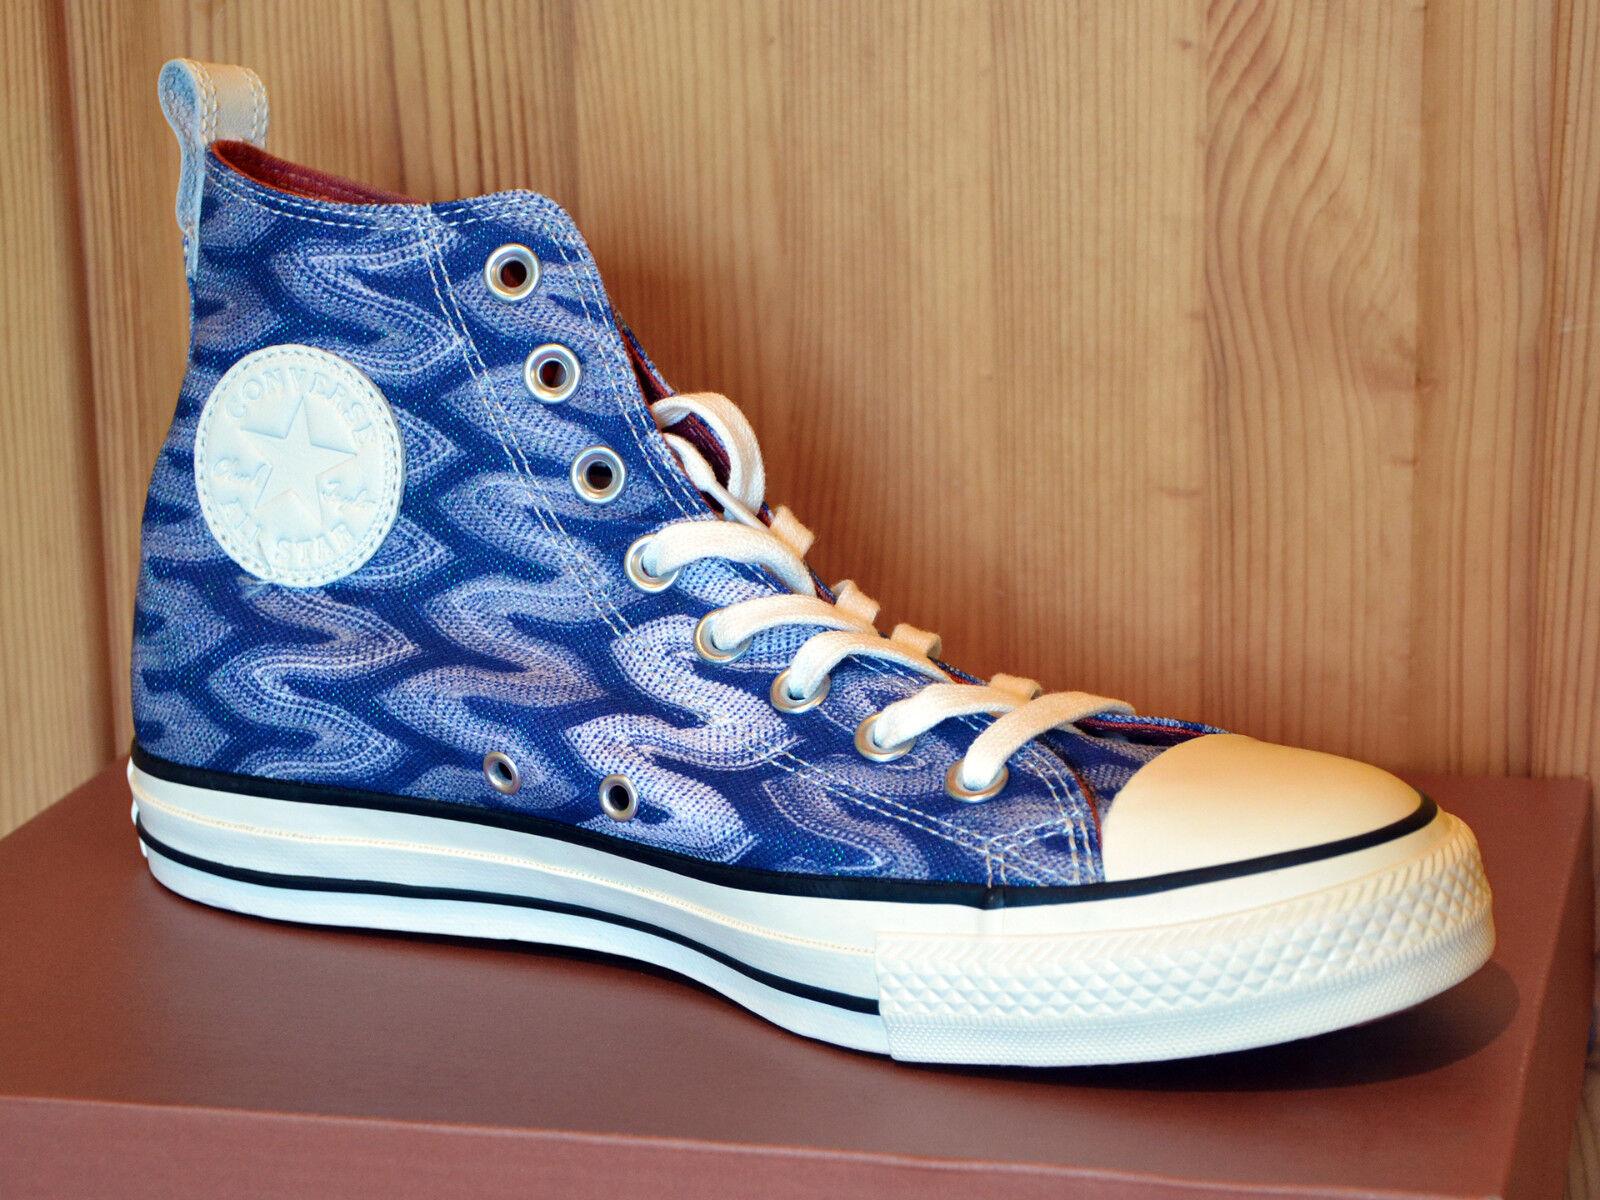 Converse Blue Chuck Taylor All Star Hi Missoni azul Blue Converse 151255c cortos nuevo 4f2666